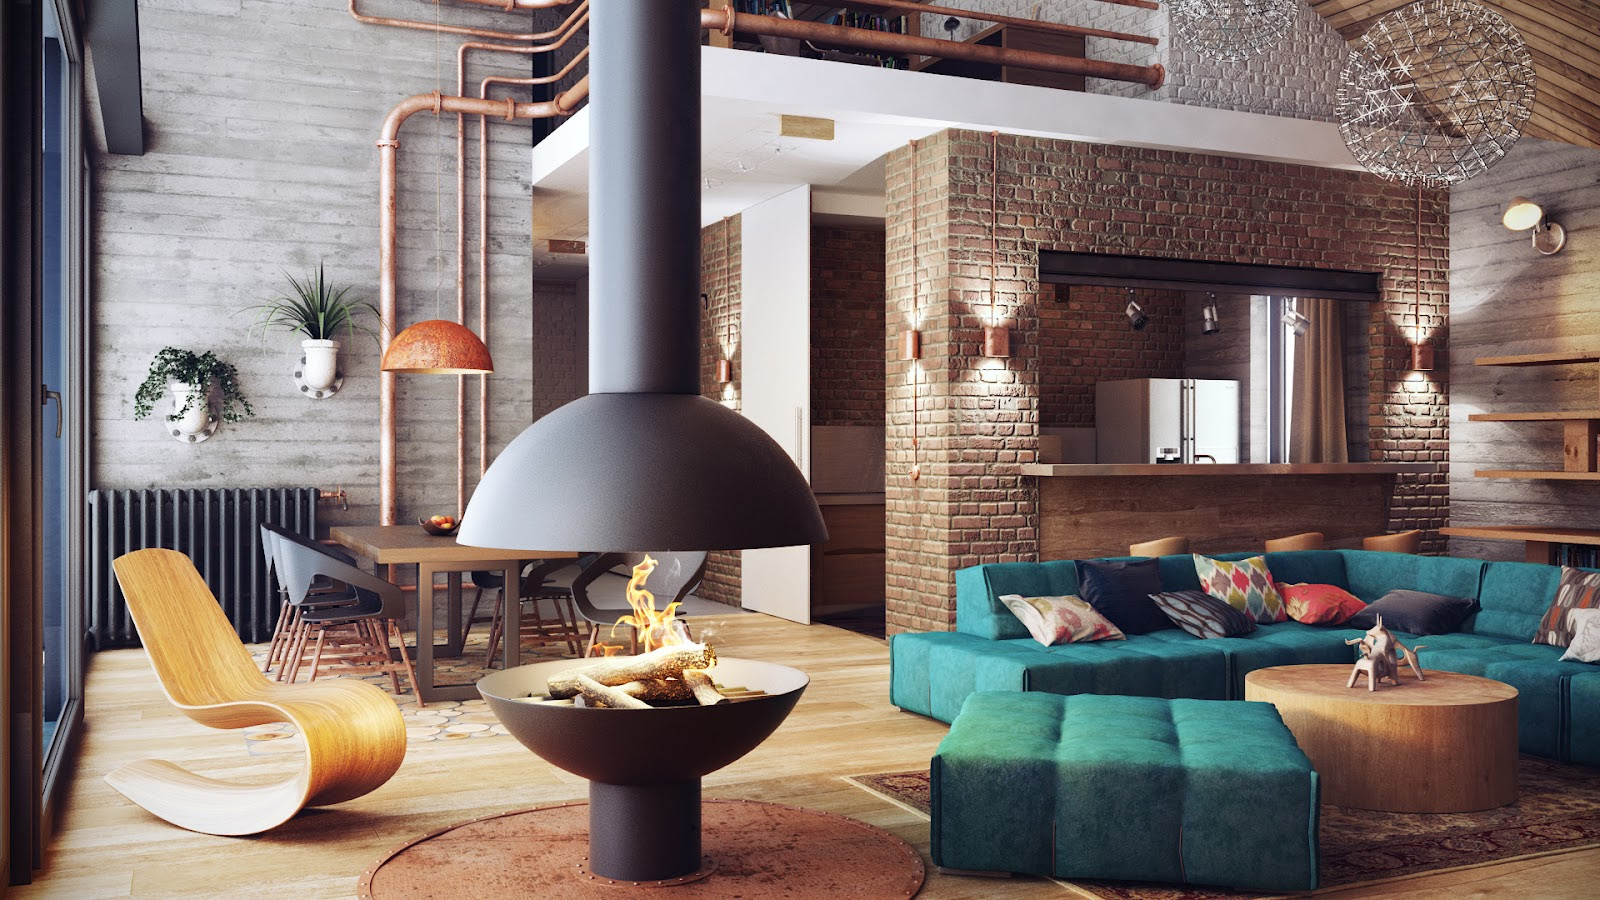 Loft-Like Interior Design by Uglyanitsa Alexander | HomeDSGN, a